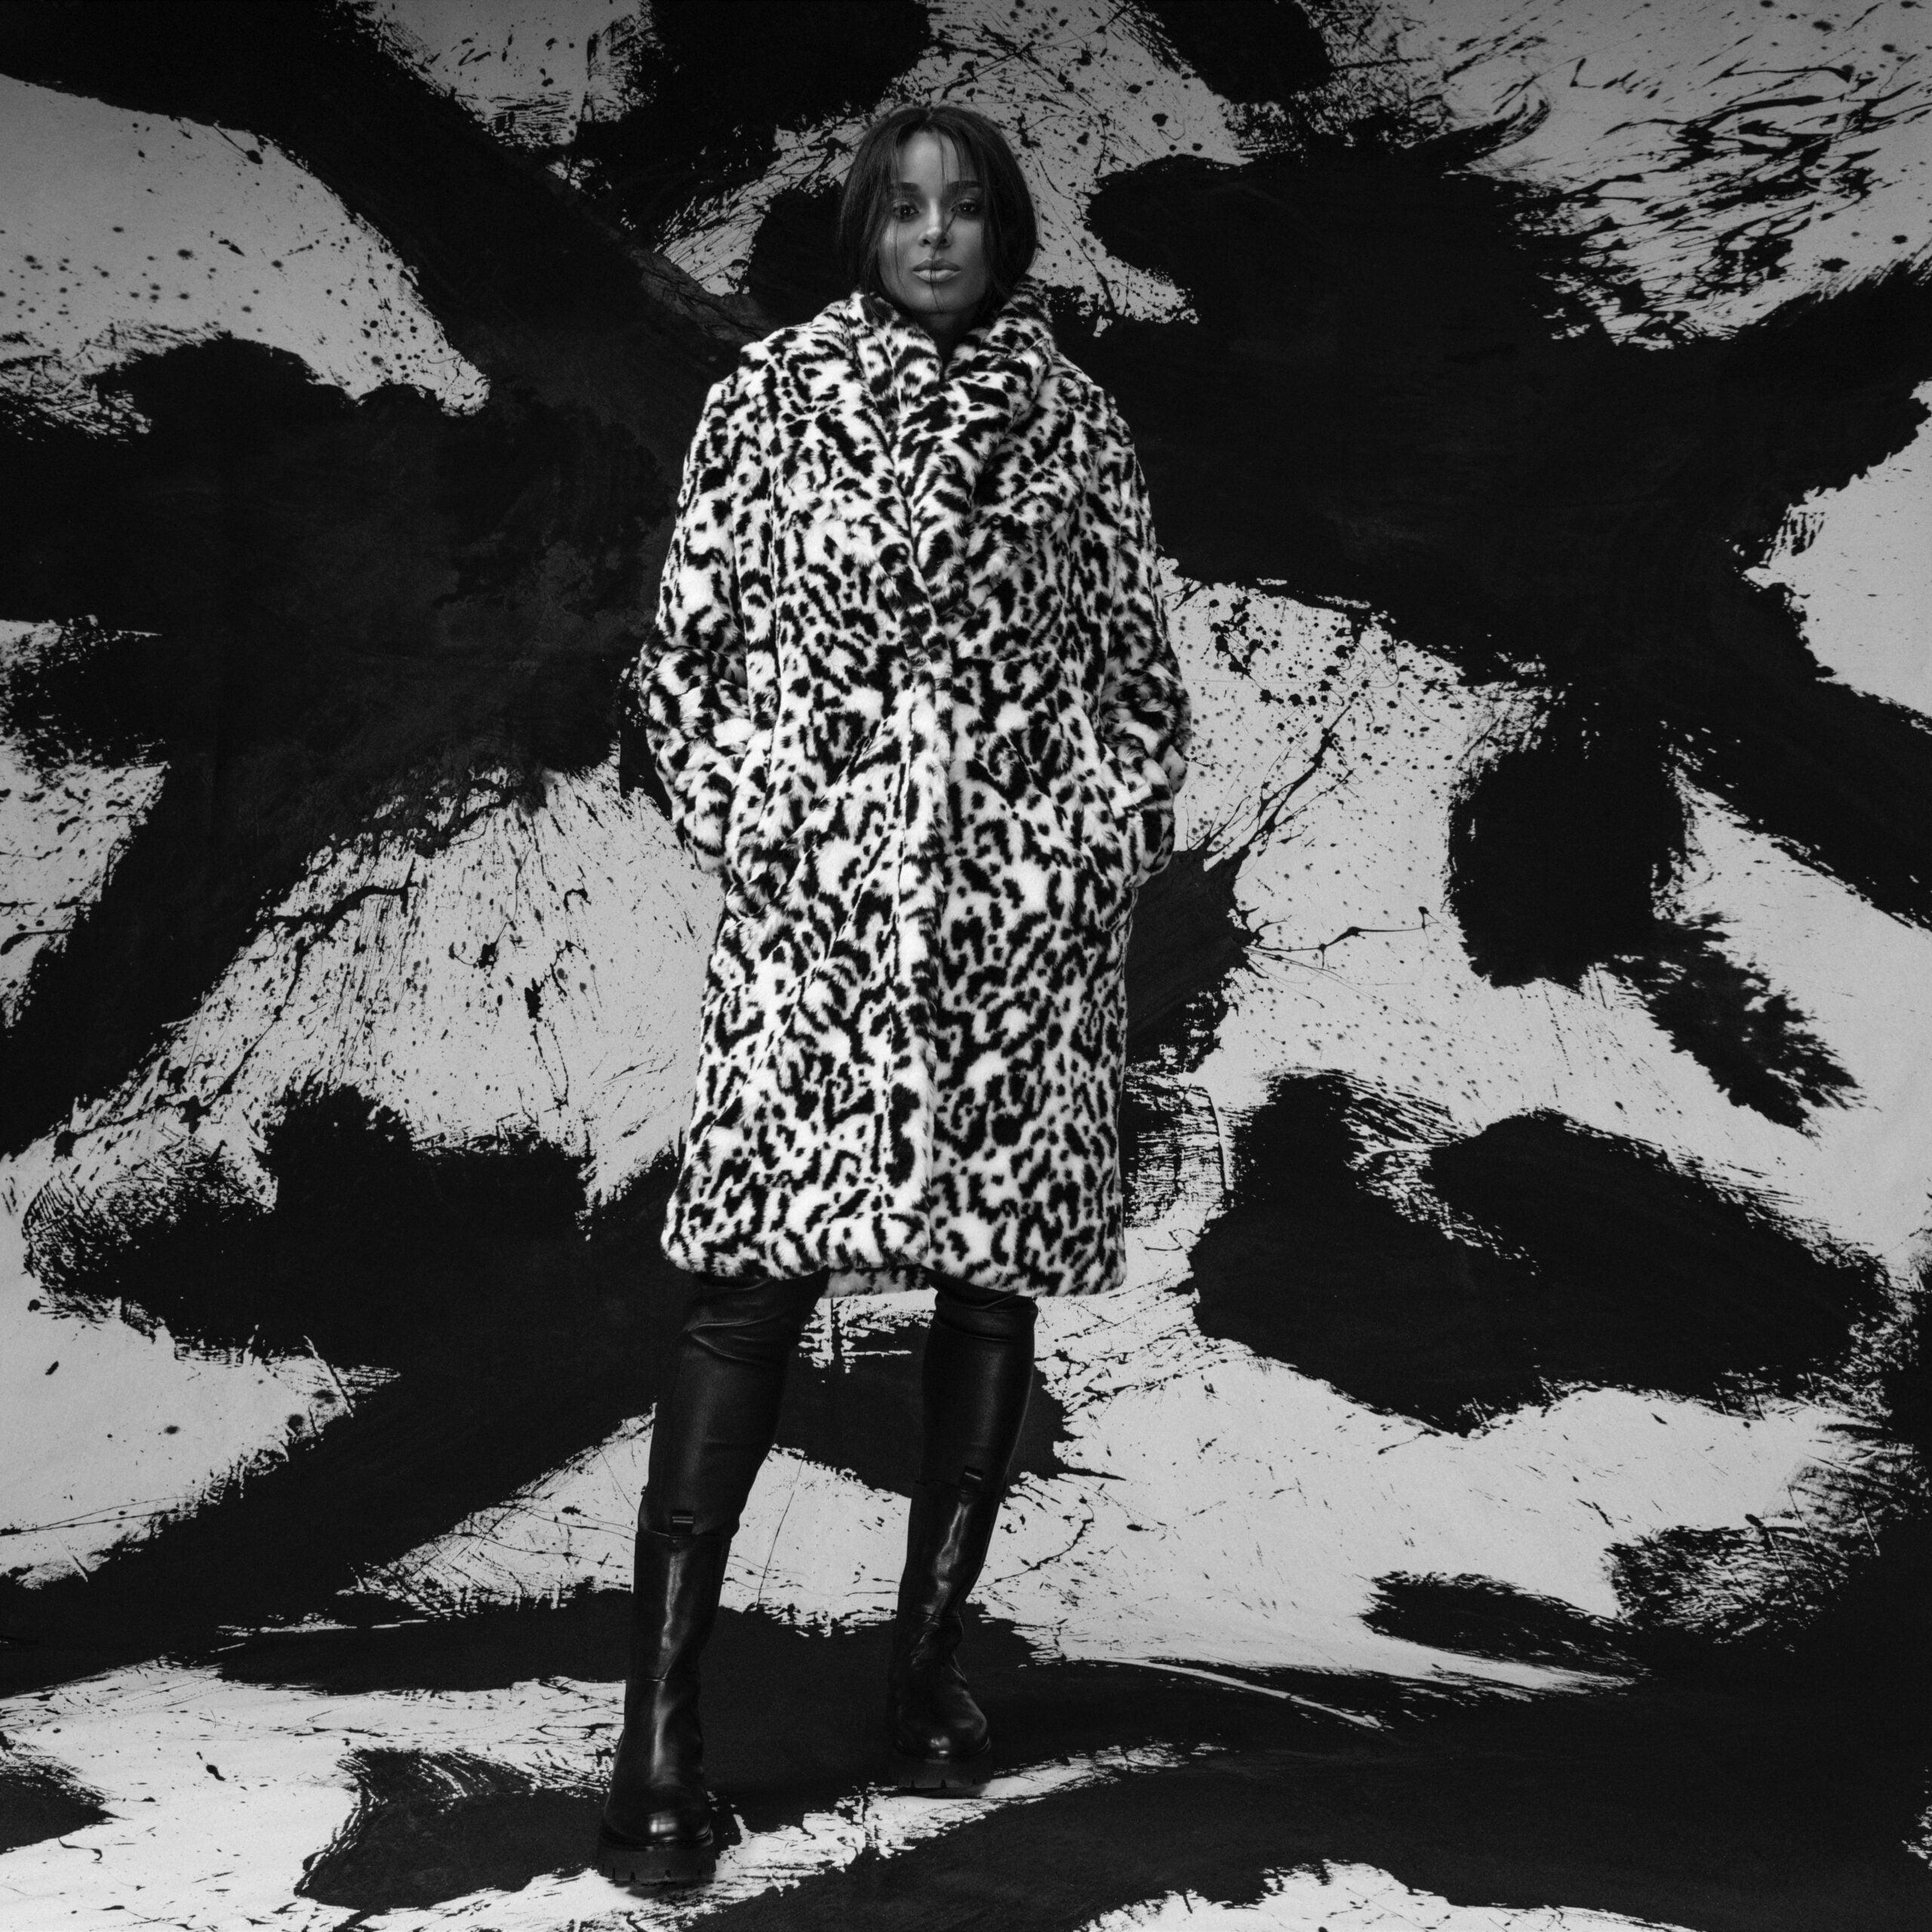 Ciara in LITA by Ciara via Jamie Santarella at ICR for use by 360 Magazine